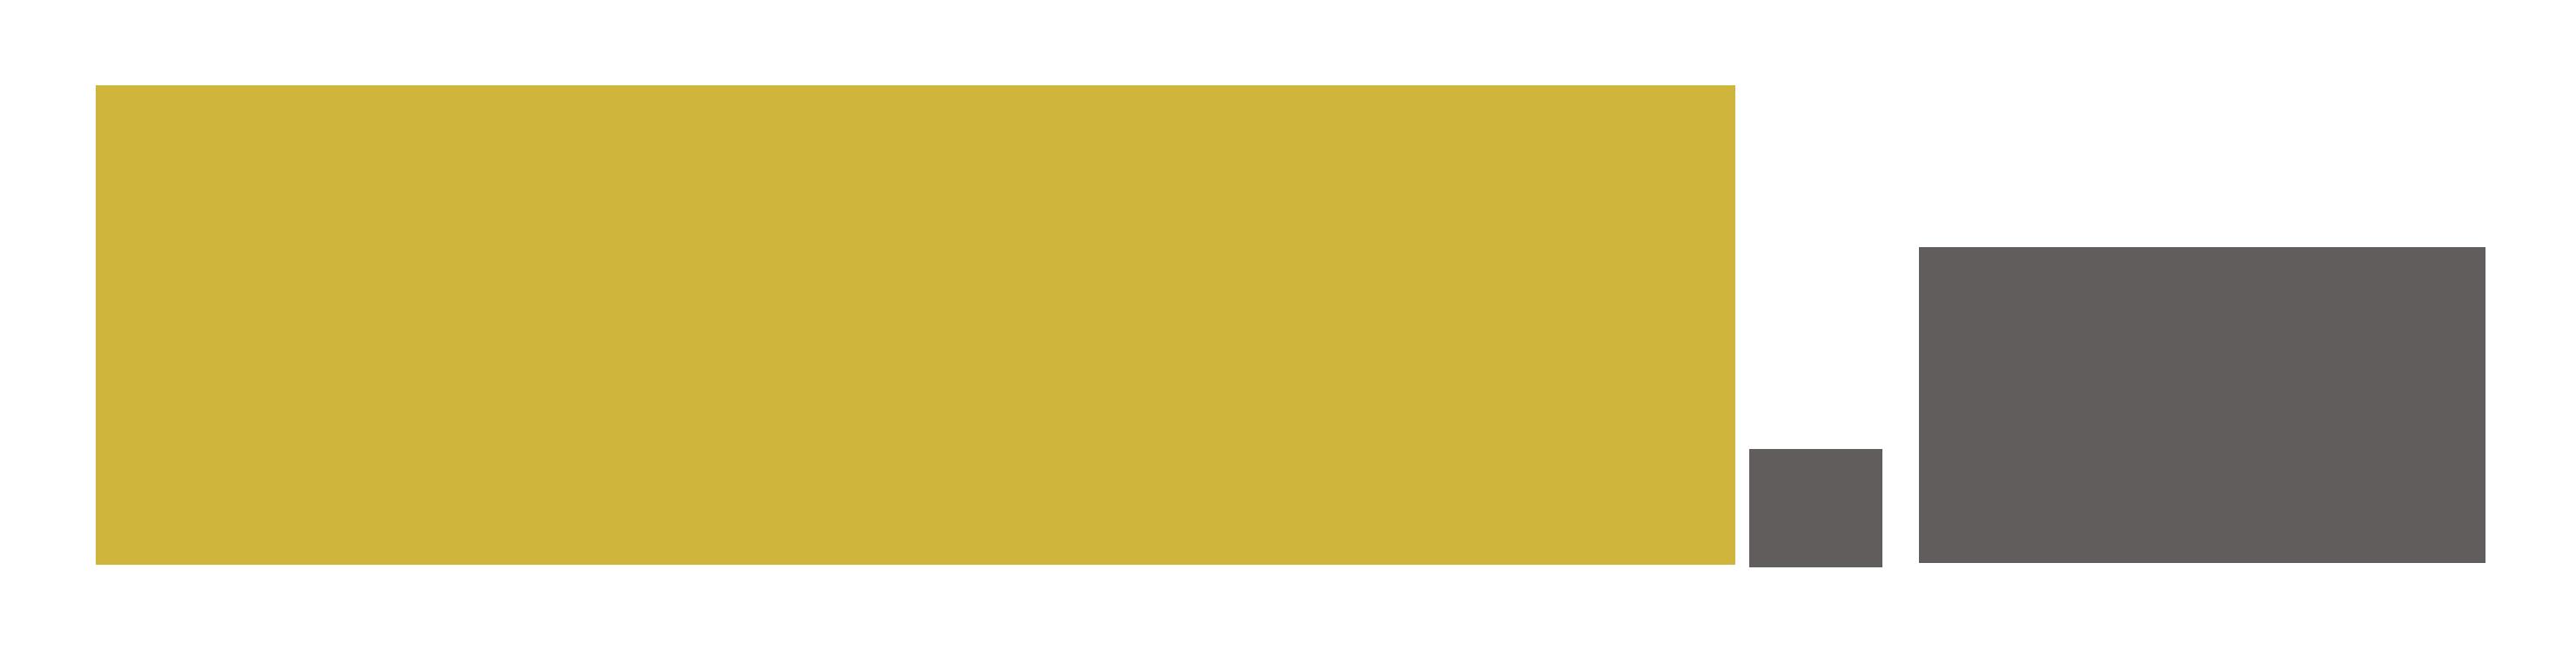 Illustrious logo